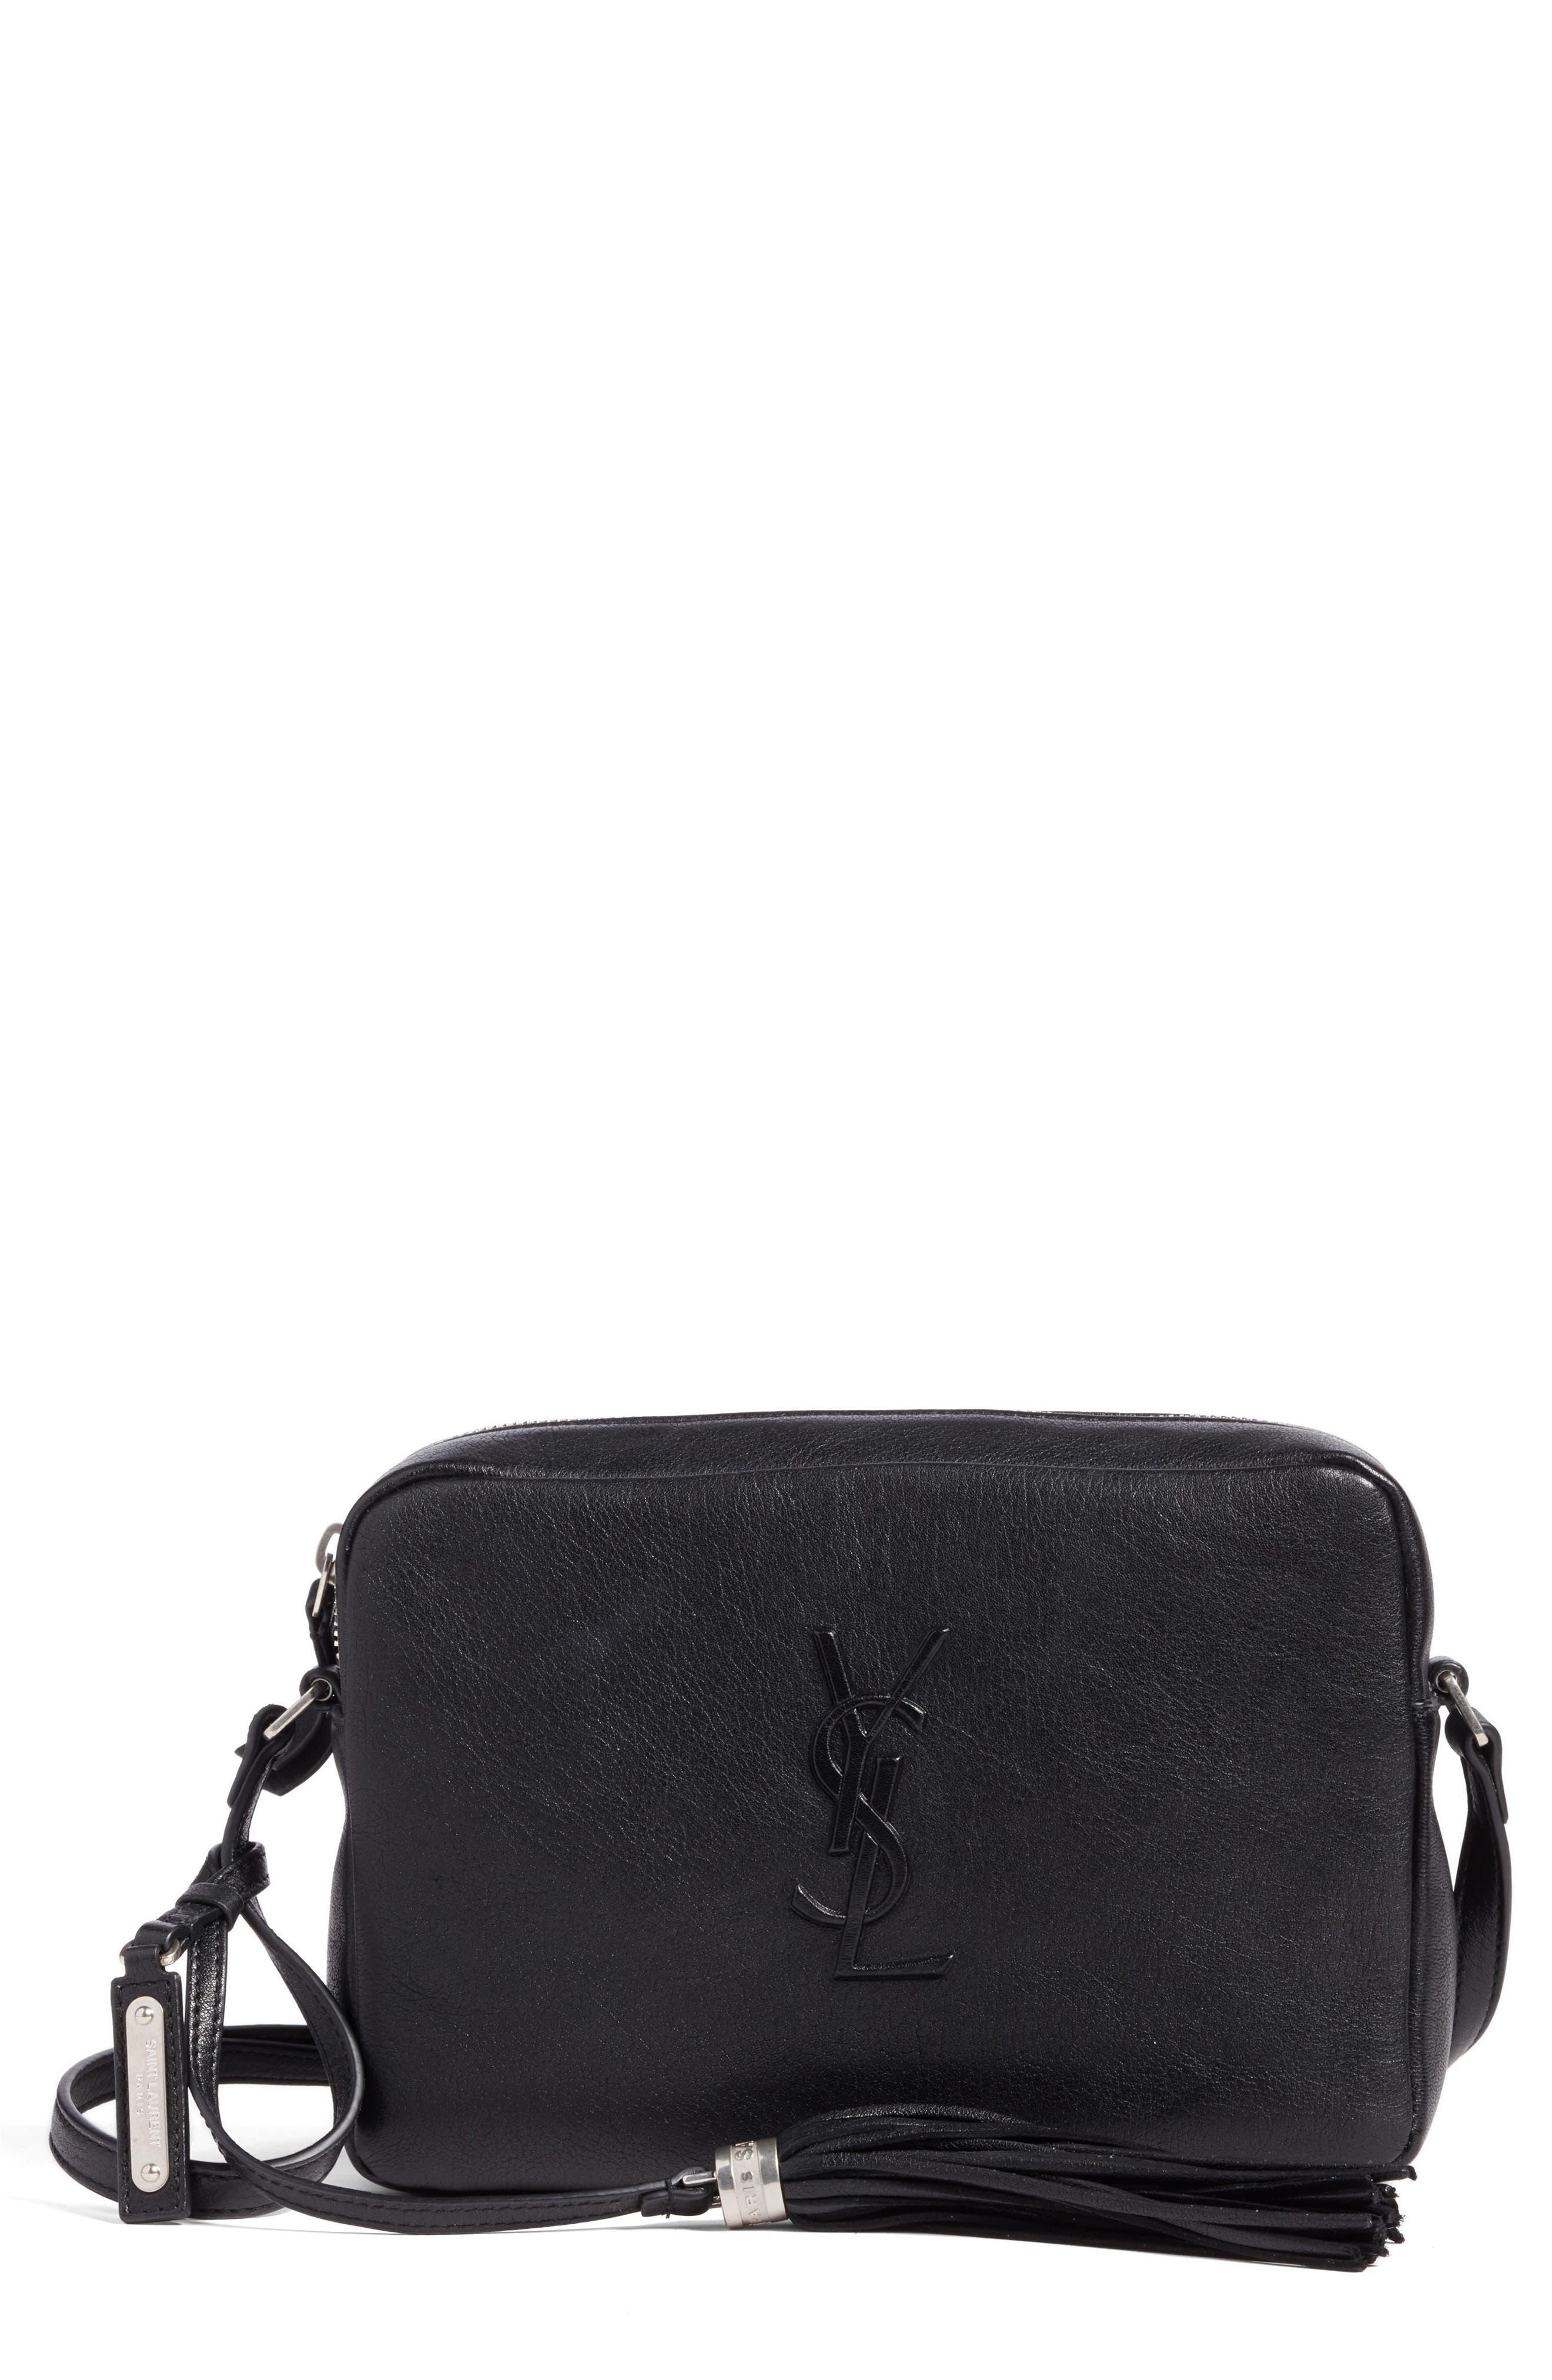 2a2b2d4a1f17 Saint Laurent Small Mono Leather Camera Bag - Black In Noir ...